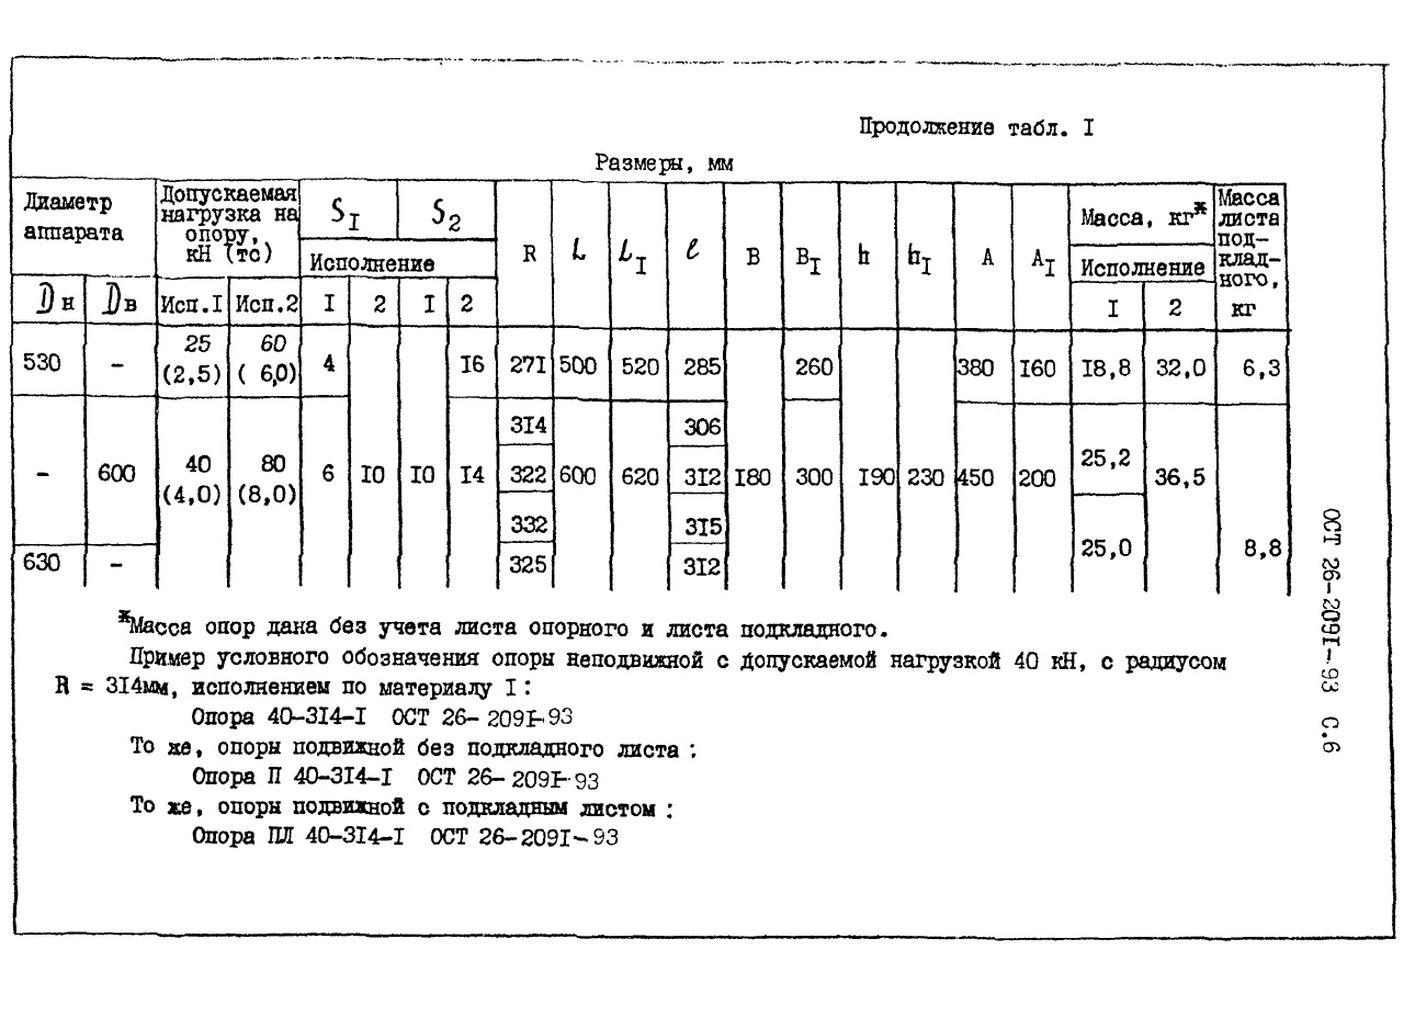 Опоры тип 1 ОСТ 26-2091-93 стр.4